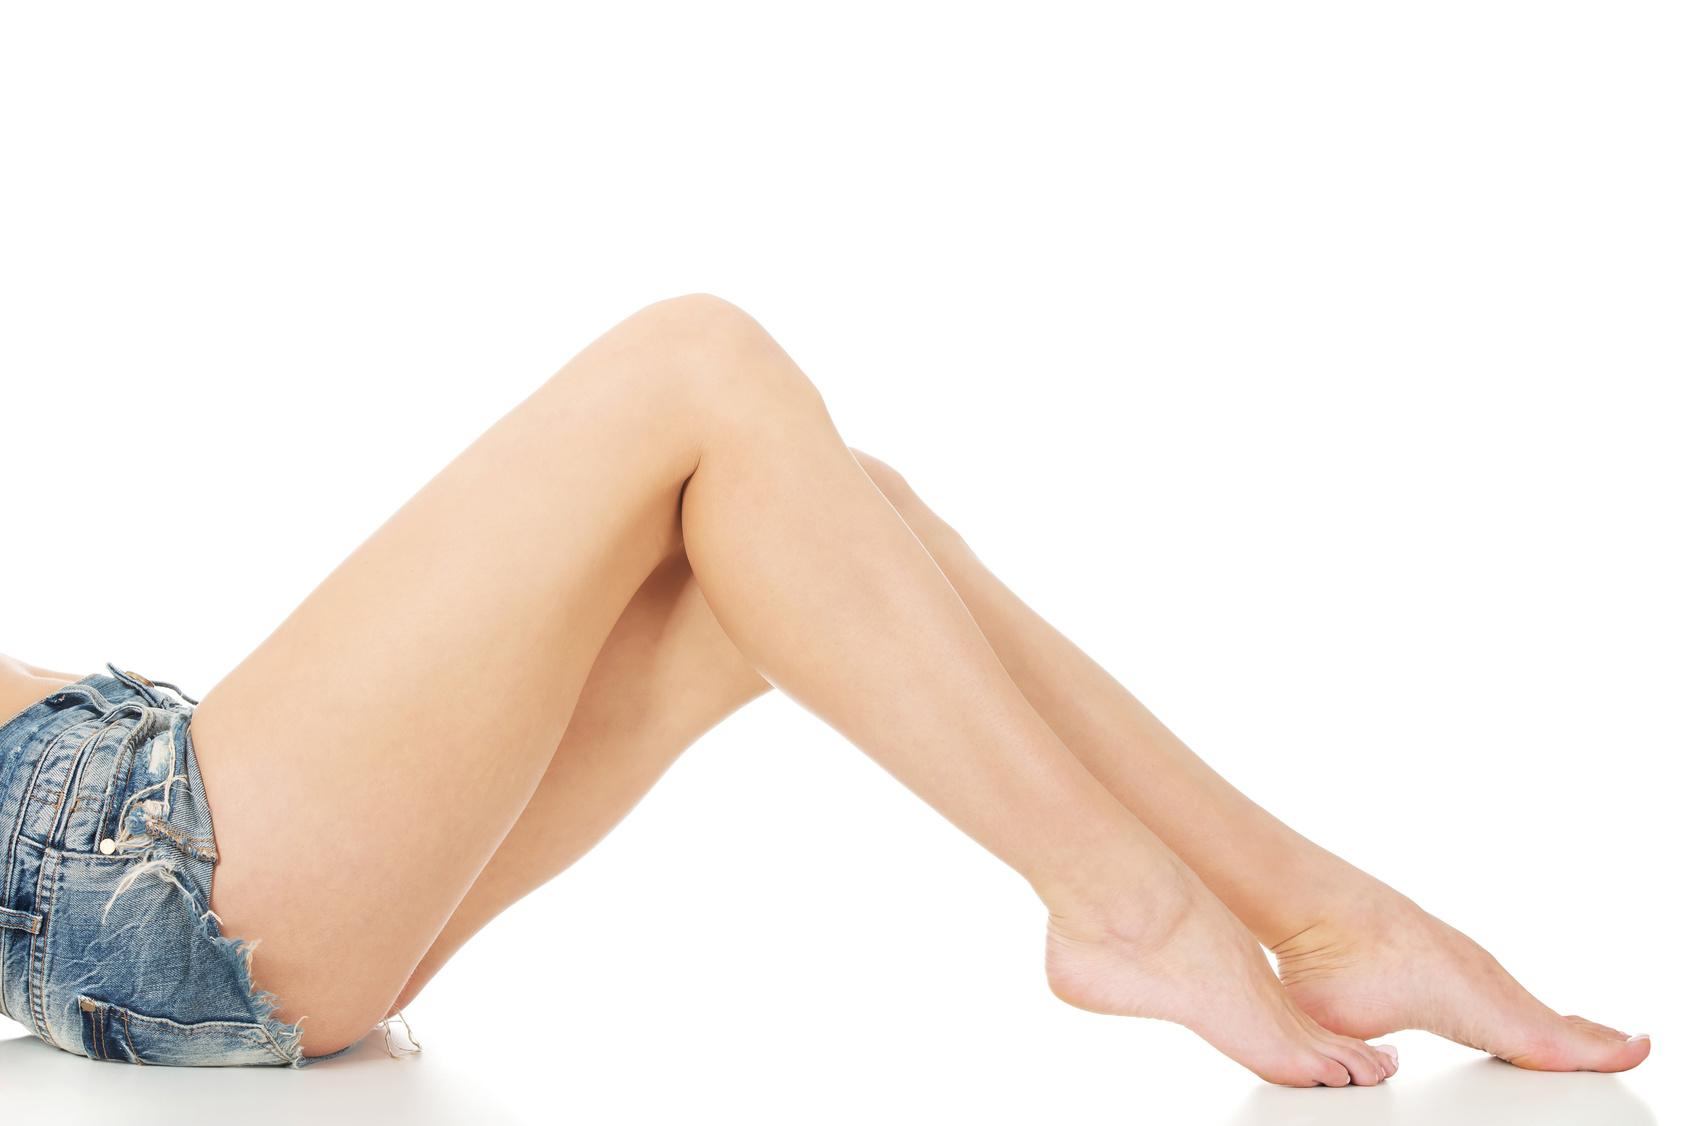 Slim woman legs in jeans shorts.